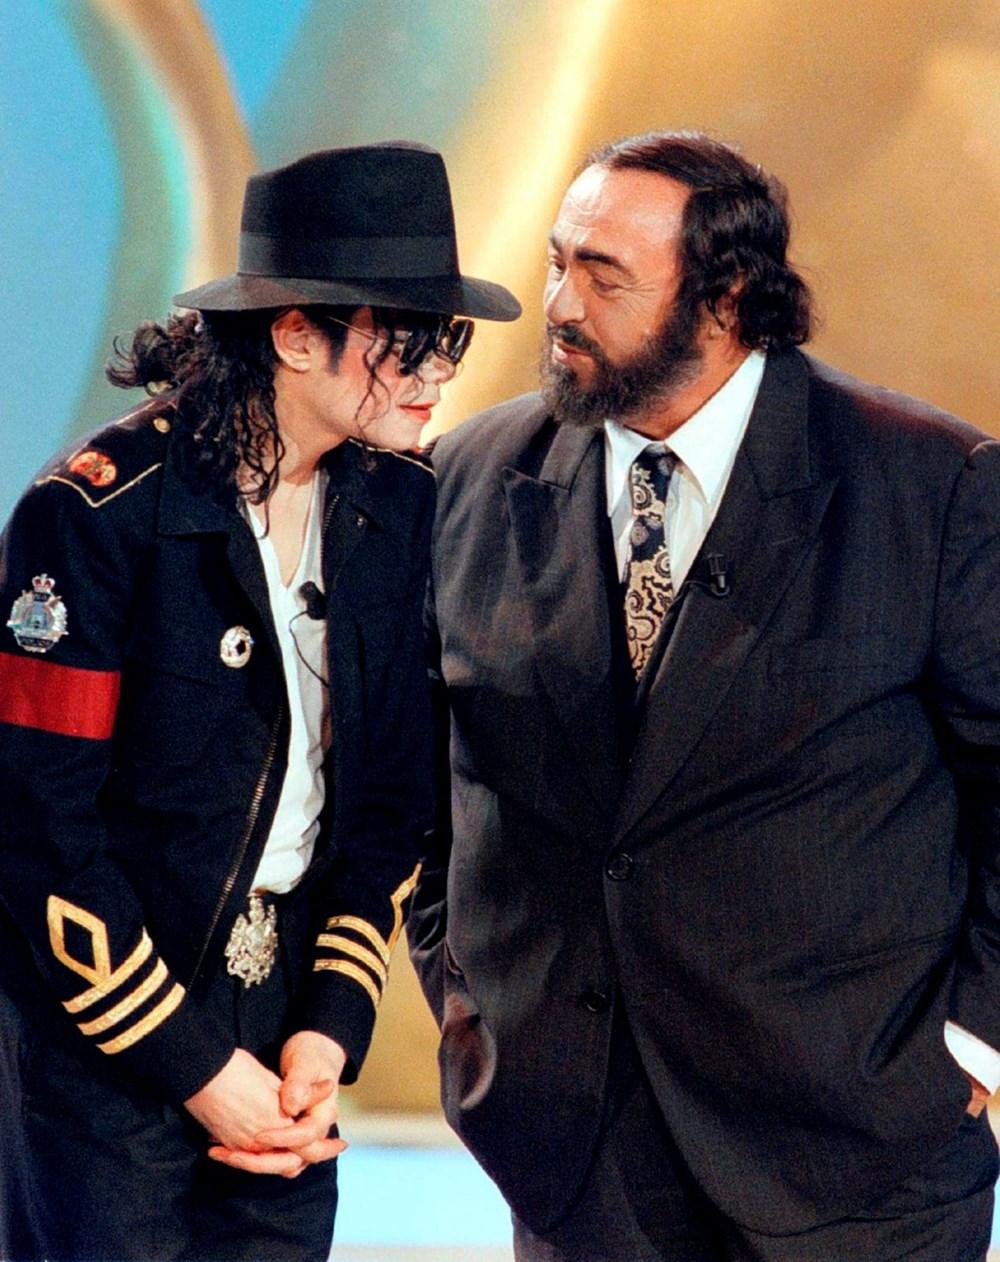 Az bilinen fotoğraflarıyla Michael Jackson - 8